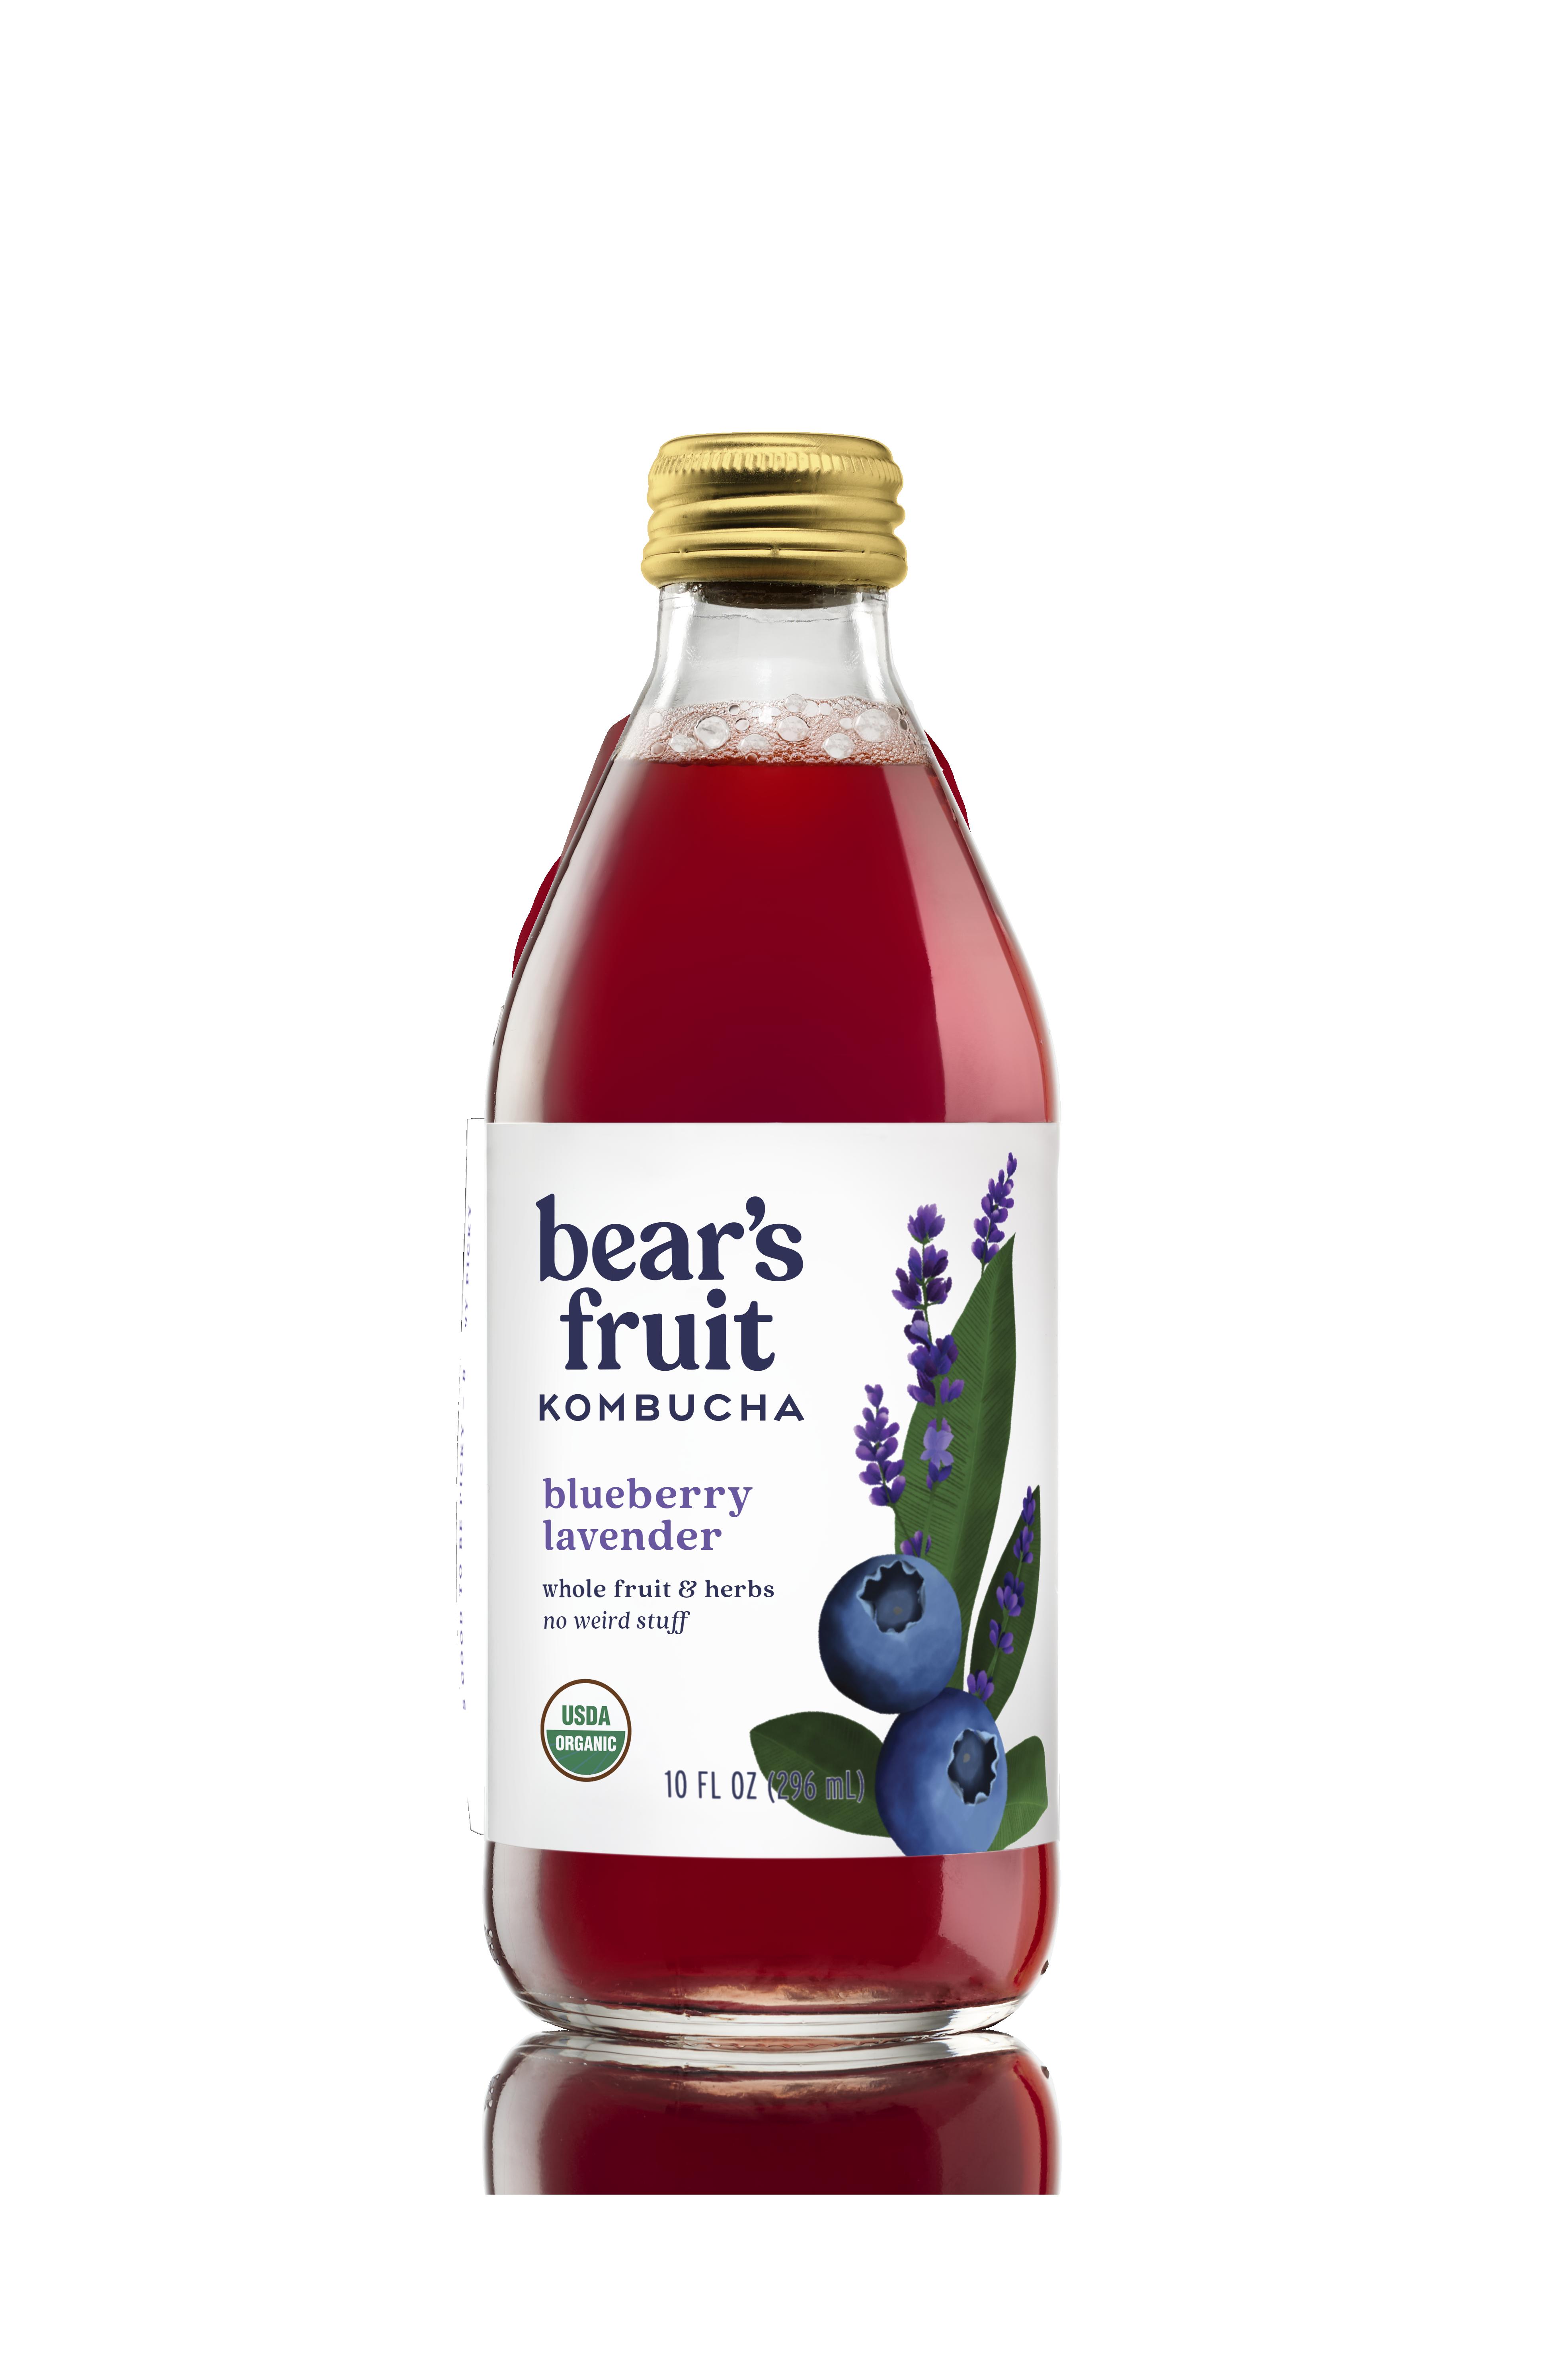 Bear's Fruit Organic Blueberry Lavender Kombucha